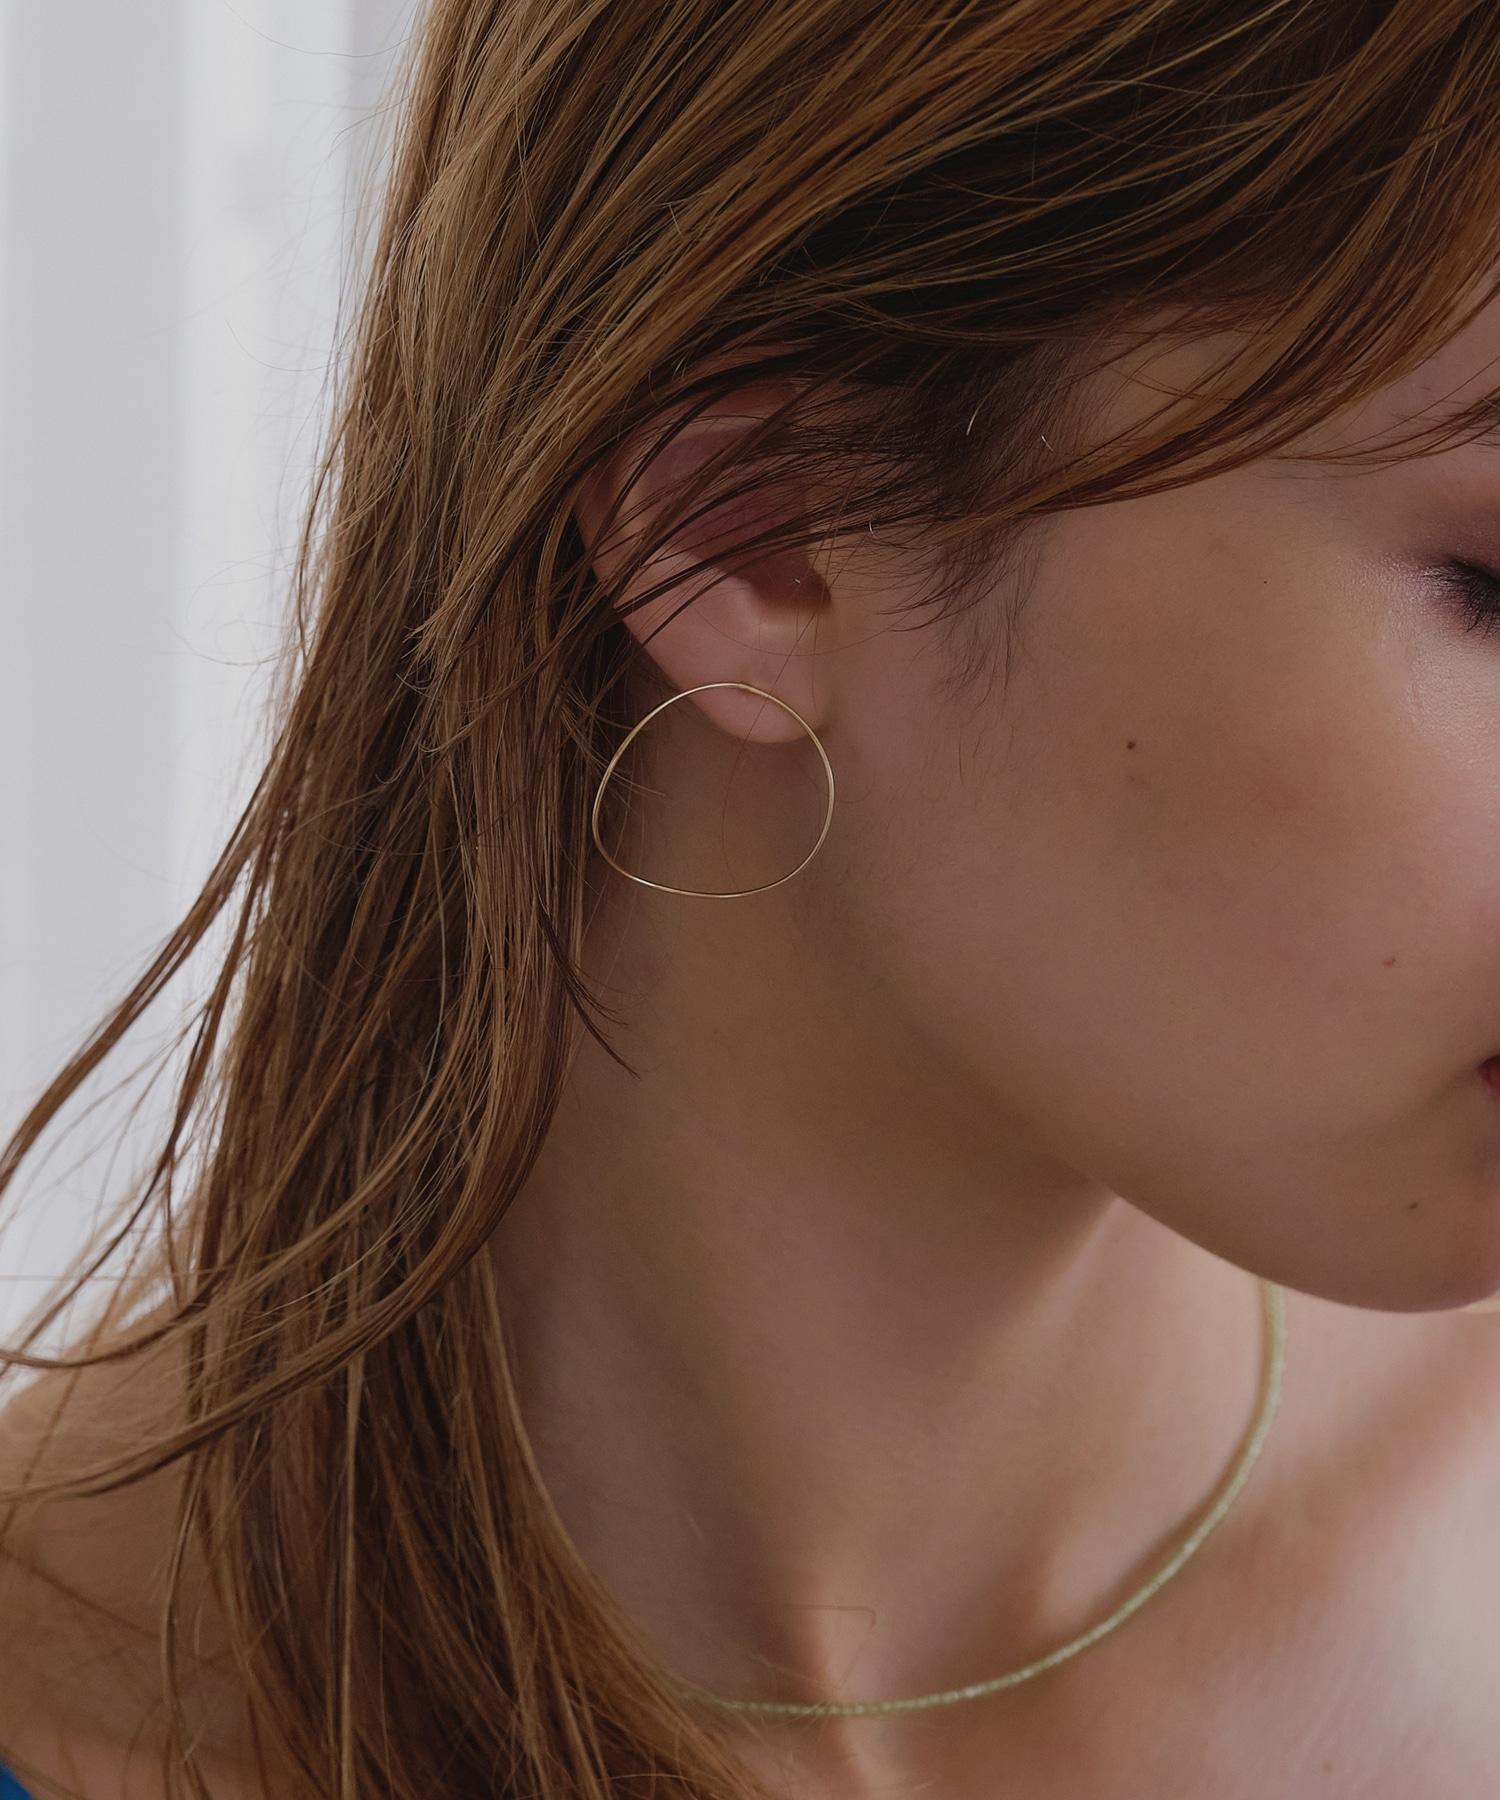 curvy circleピアス